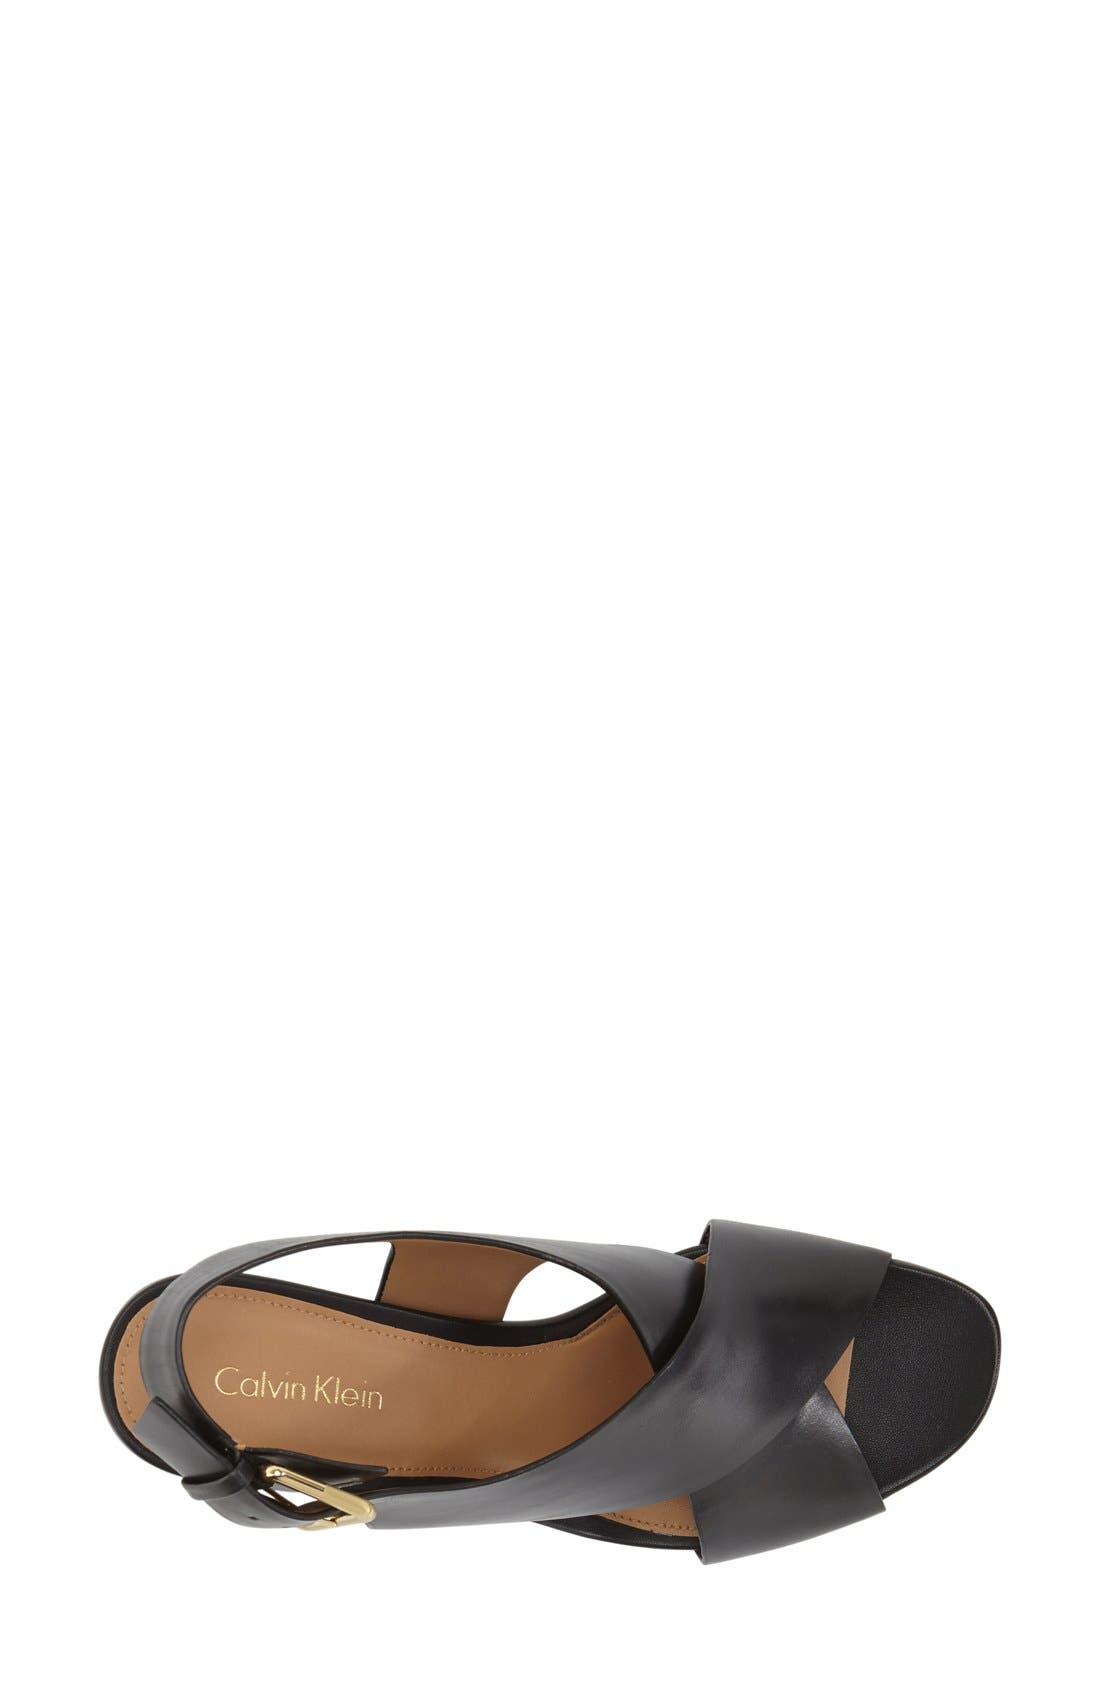 Alternate Image 3  - Calvin Klein 'Loni' Clear Block Heel Sandal (Women)